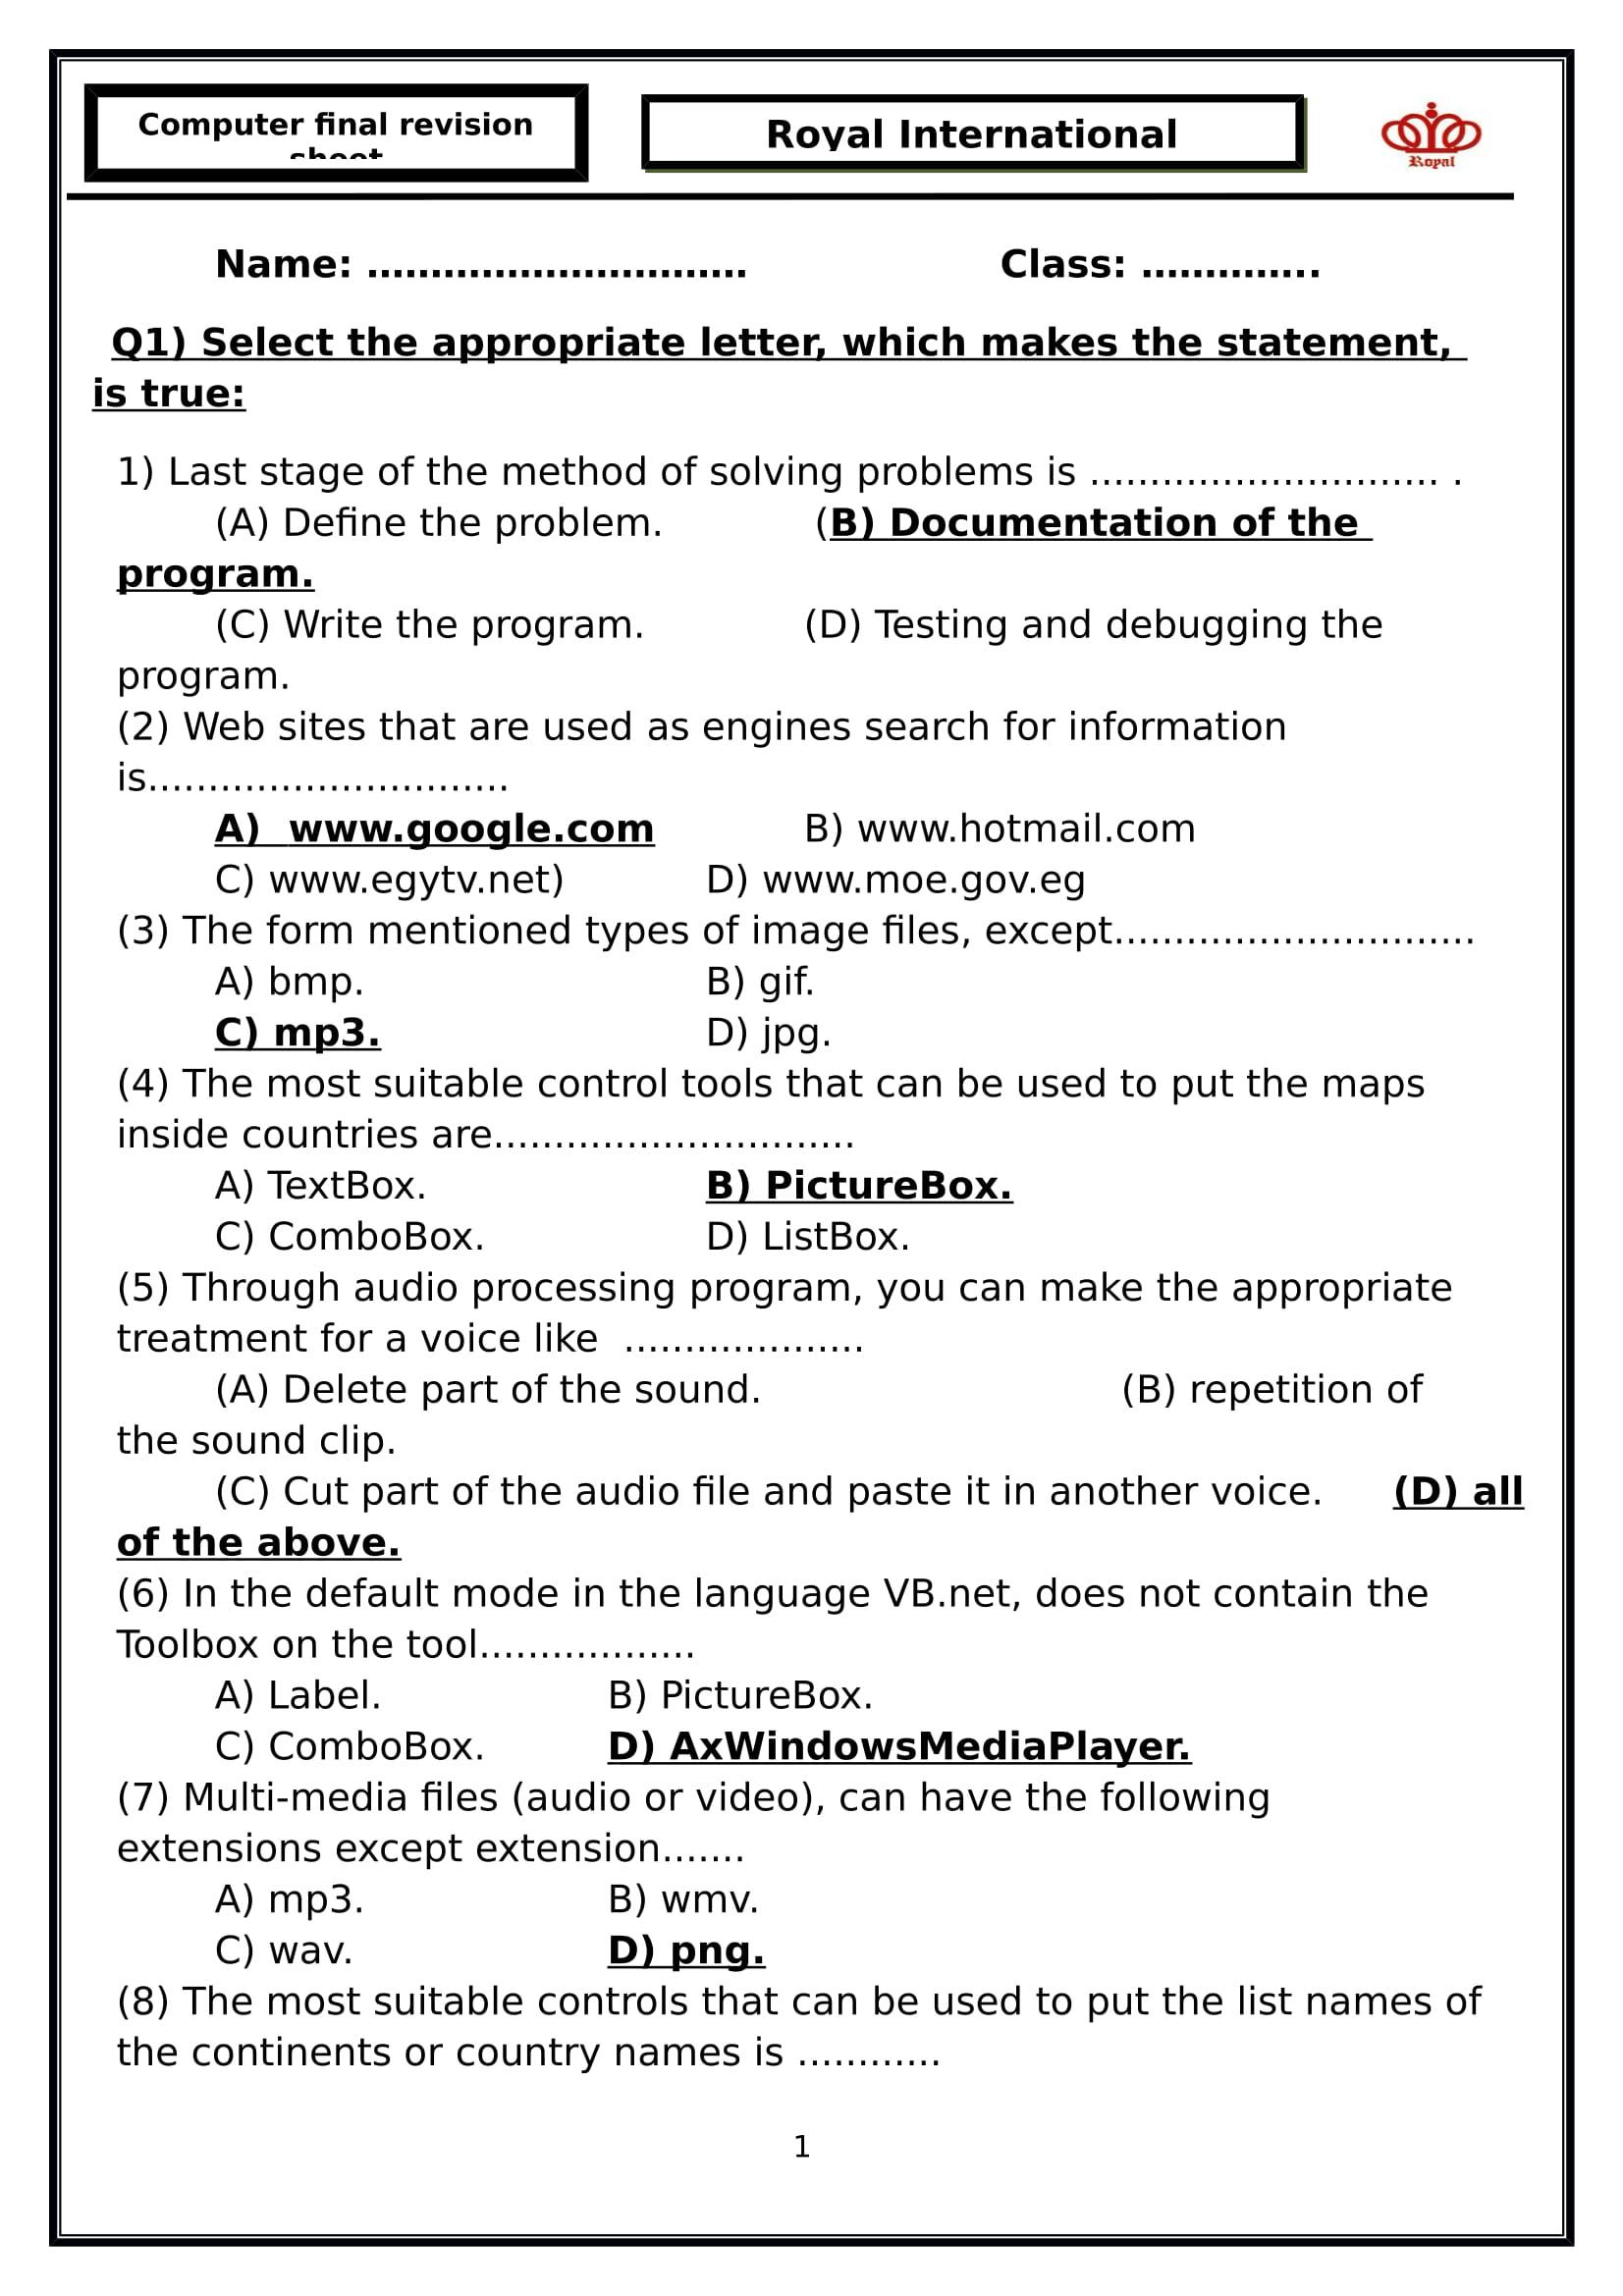 exam-eg.com_1511533255951.jpg